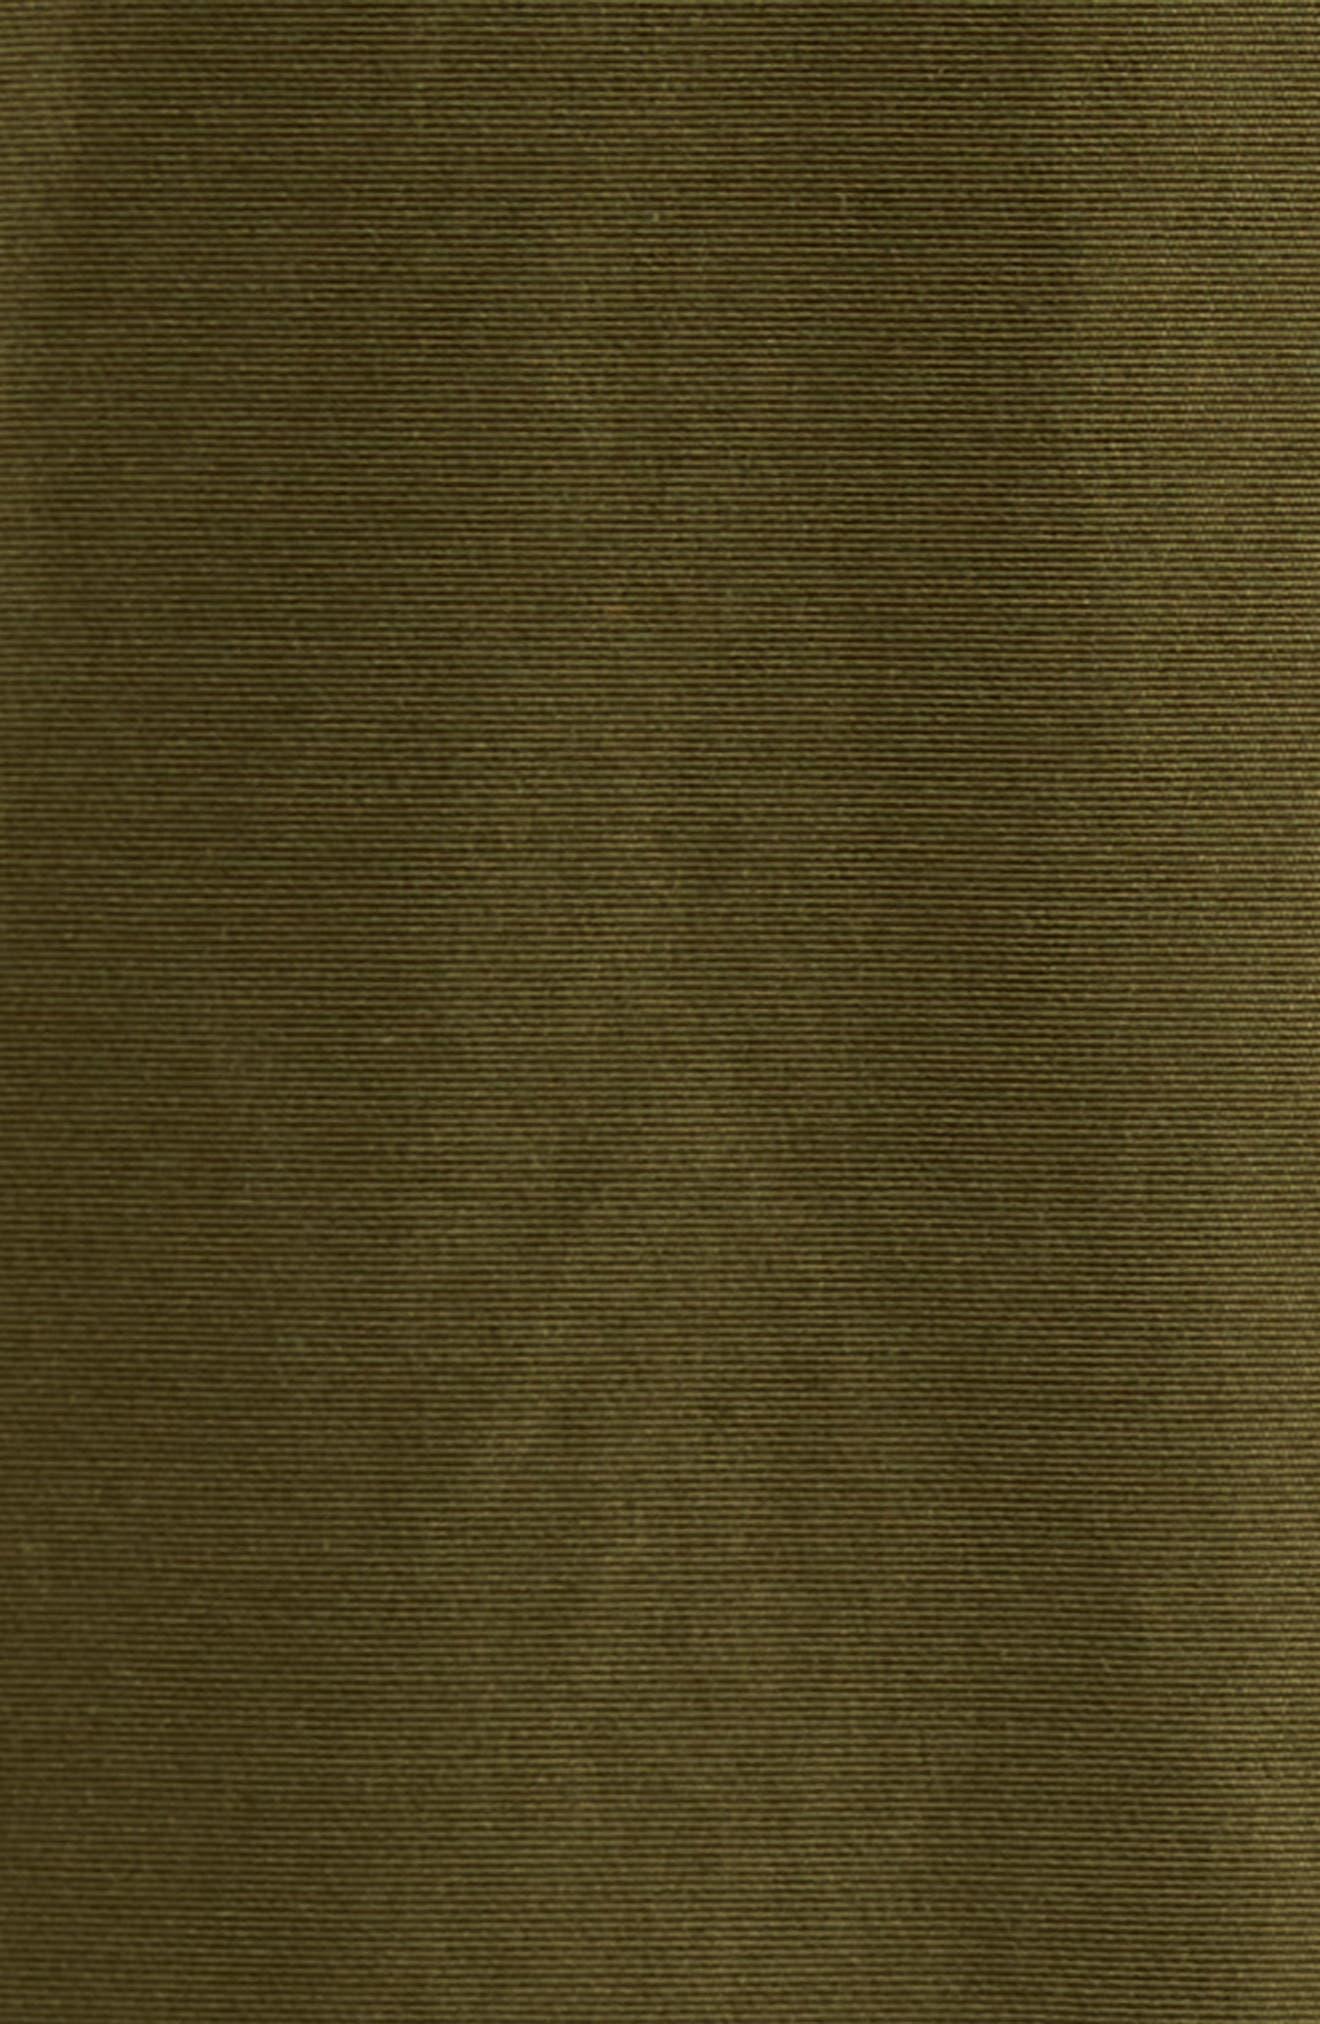 John Rich 'Long Military Eskimo' 3-in-1 Hooded Jacket,                             Alternate thumbnail 7, color,                             FLINT OLIVE